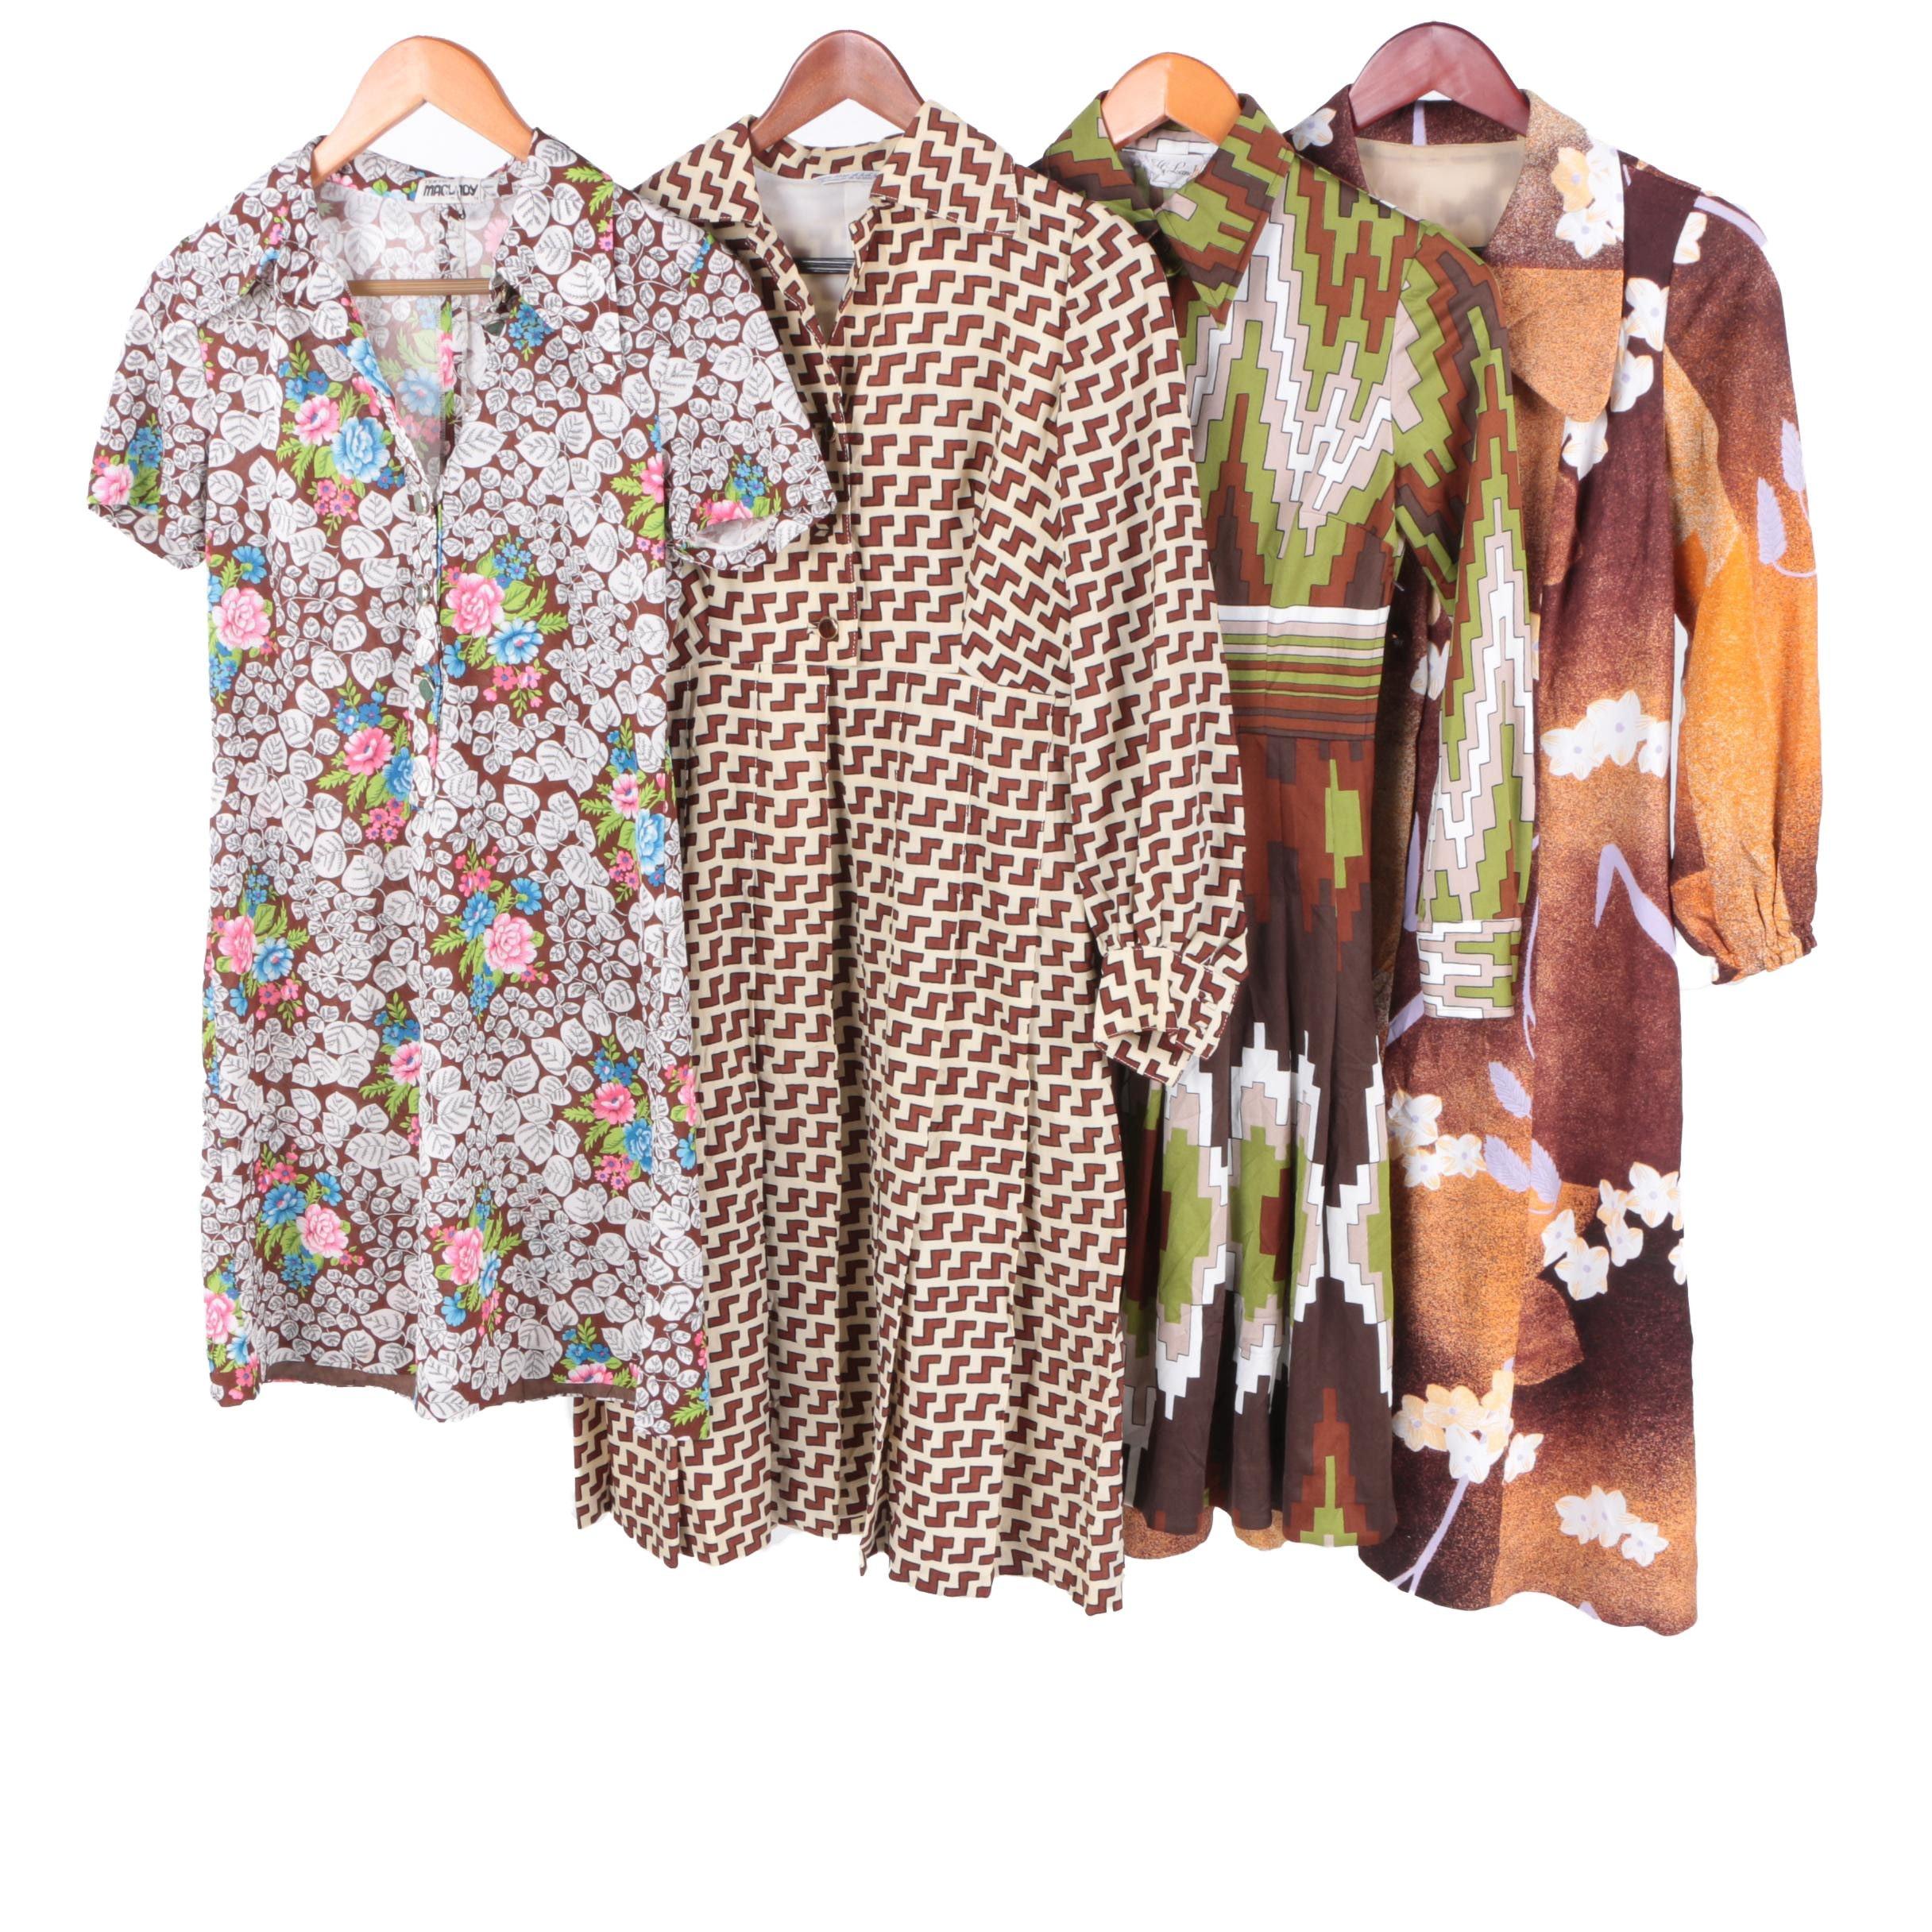 Printed Dresses Including Circa 1970s Lily Mode Shop Kumamoto